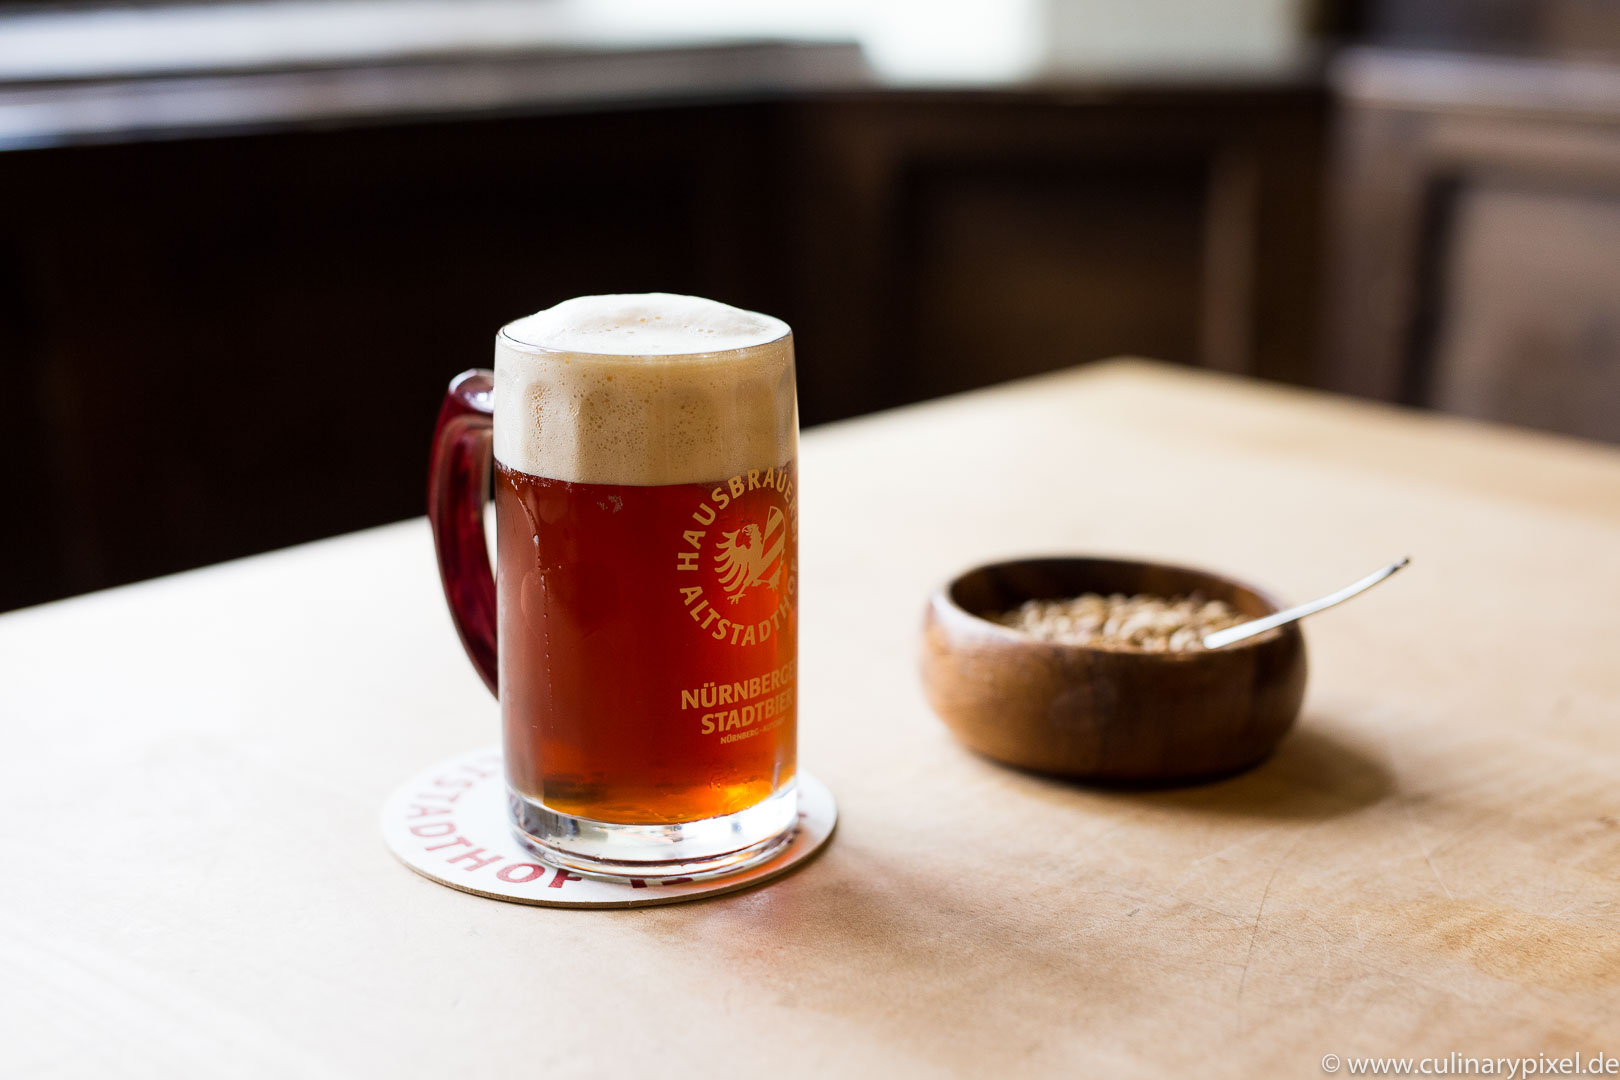 Brauerei Altstadthof Nürnberg